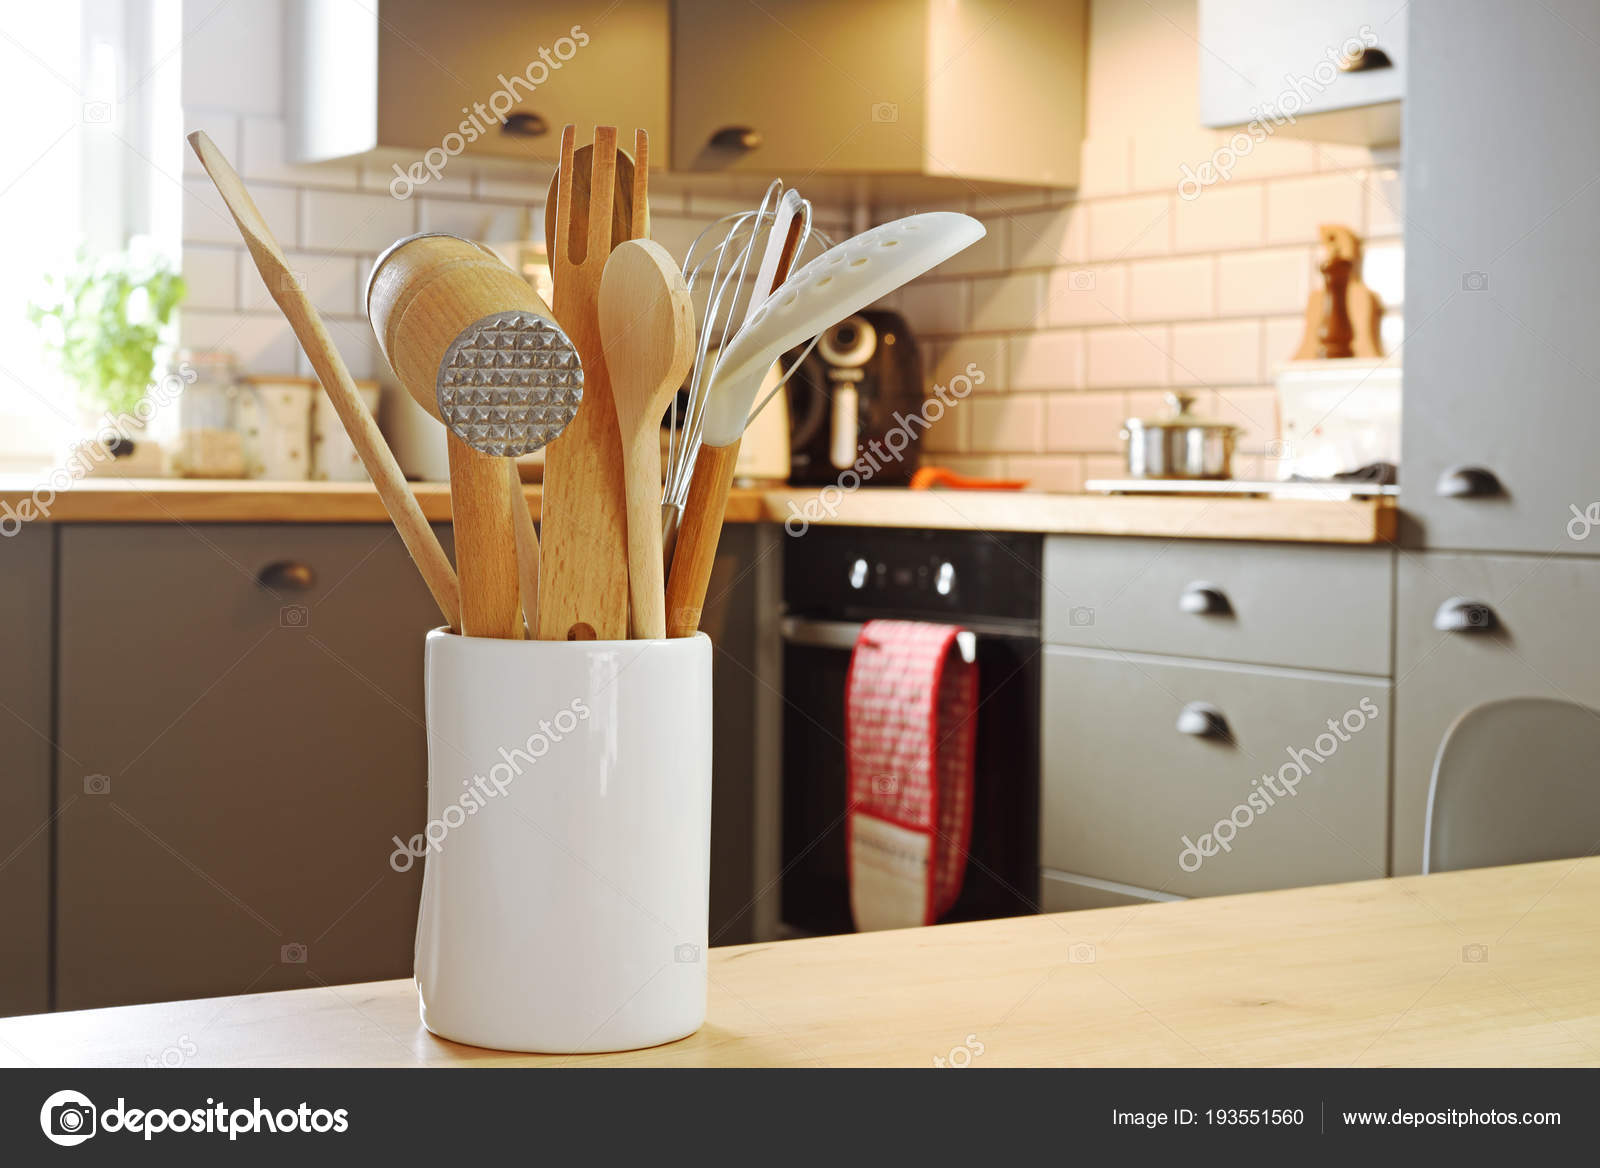 Set accessori da cucina arredamento e casalinghi in vendita a napoli